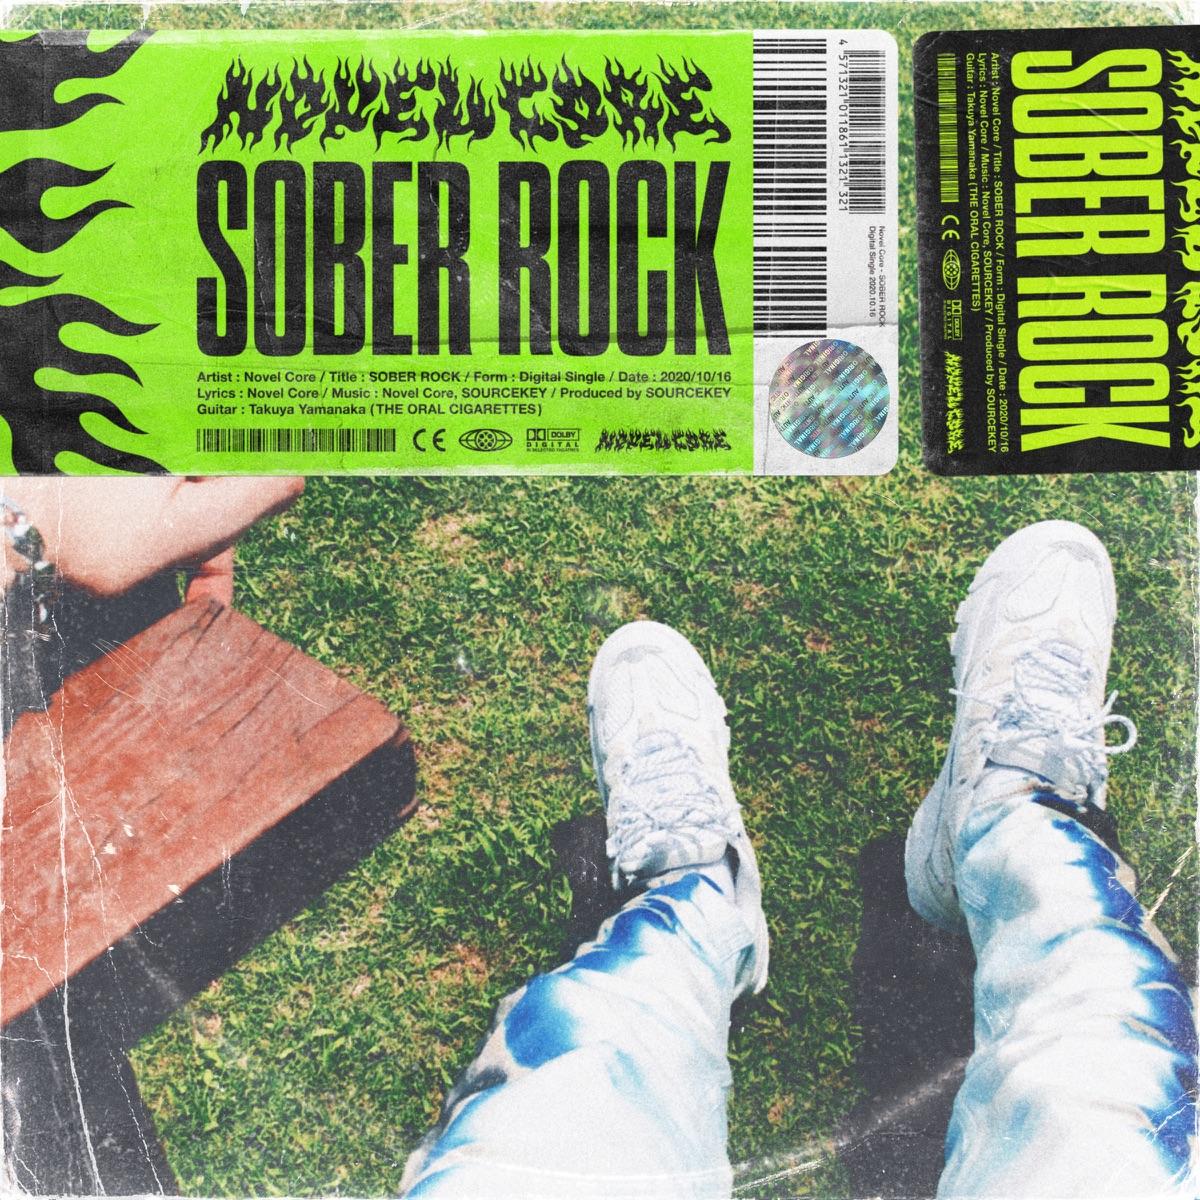 『Novel Core - SOBER ROCK』収録の『SOBER ROCK』ジャケット